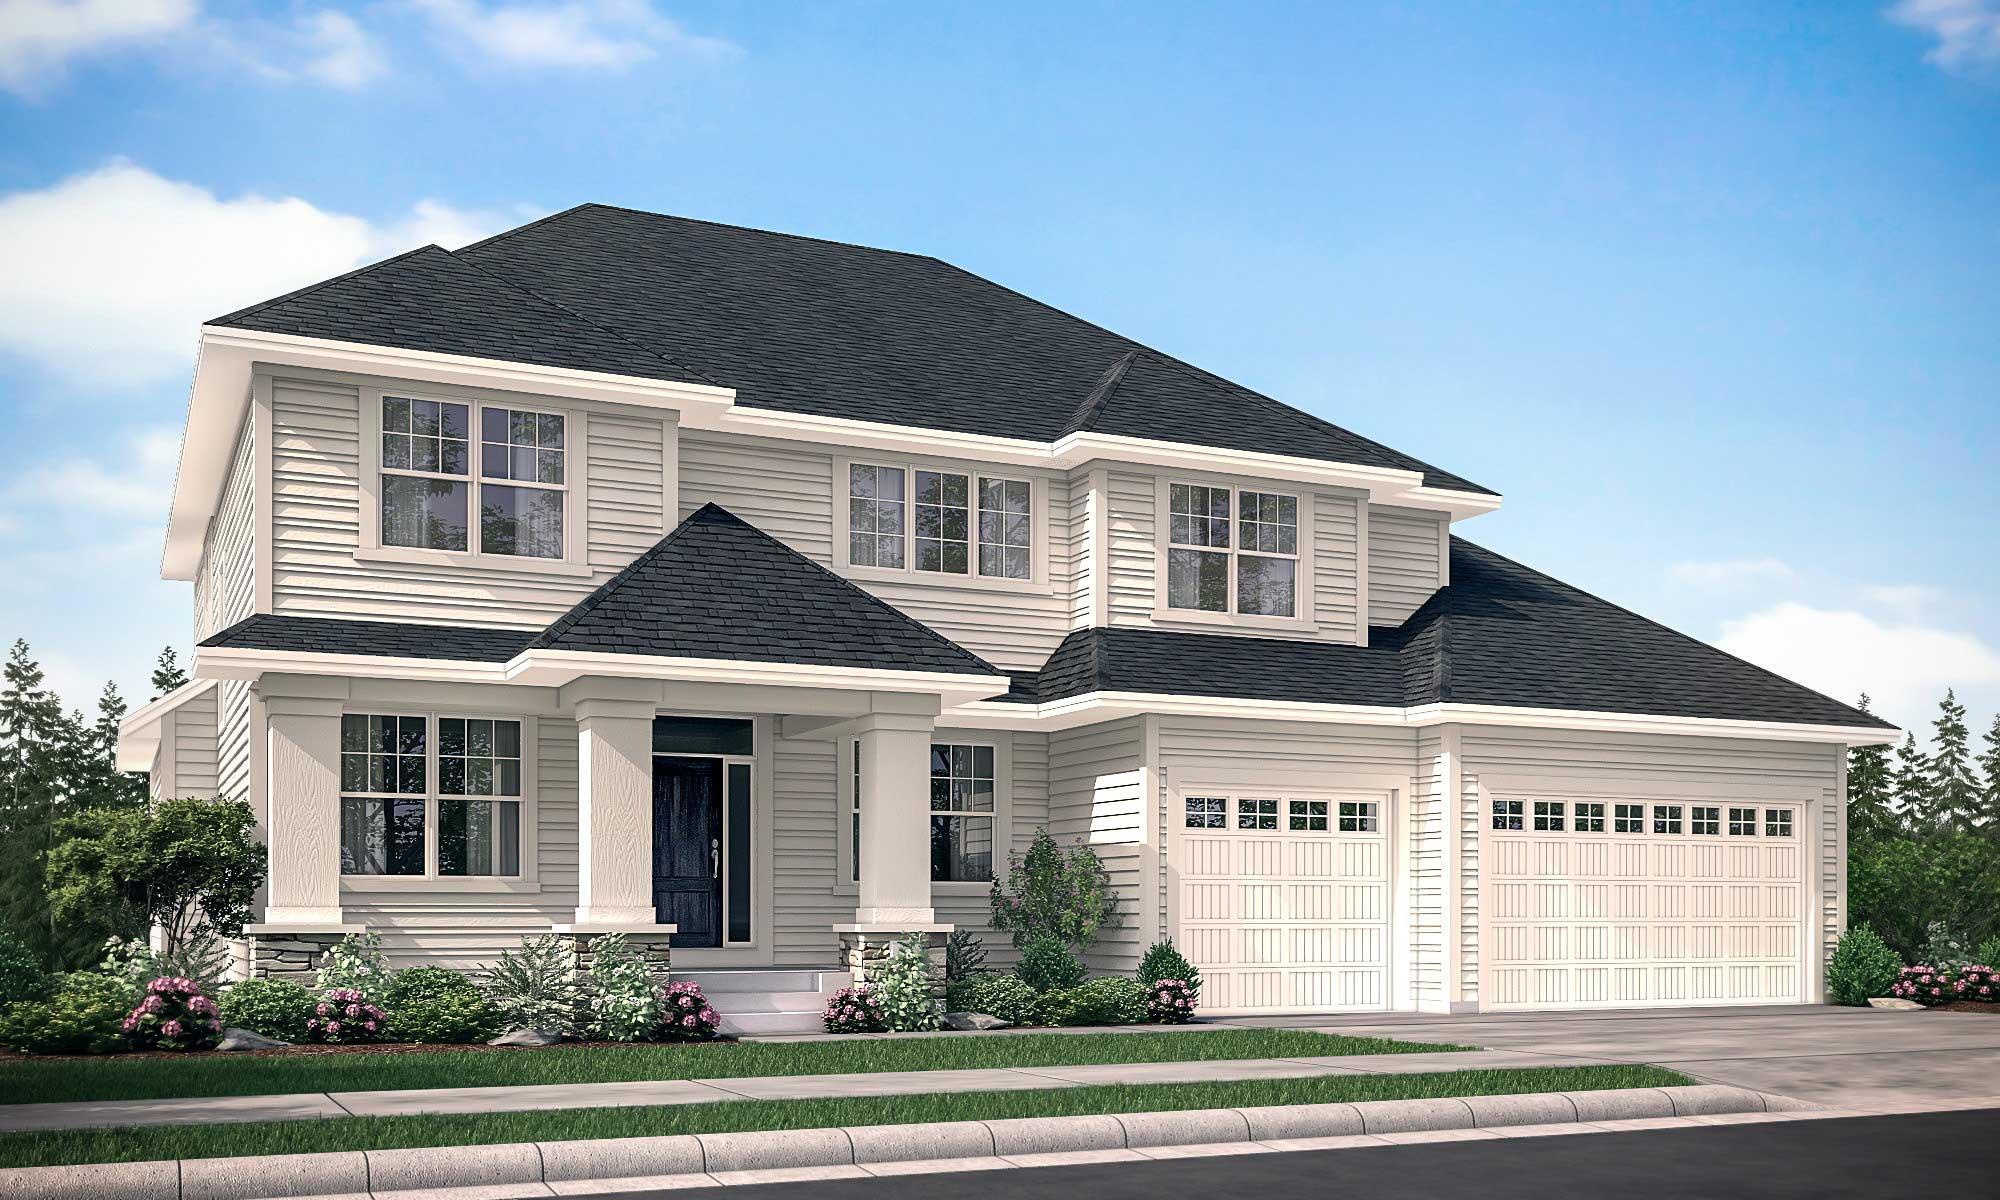 Exterior rendering of home with Nokomis C design